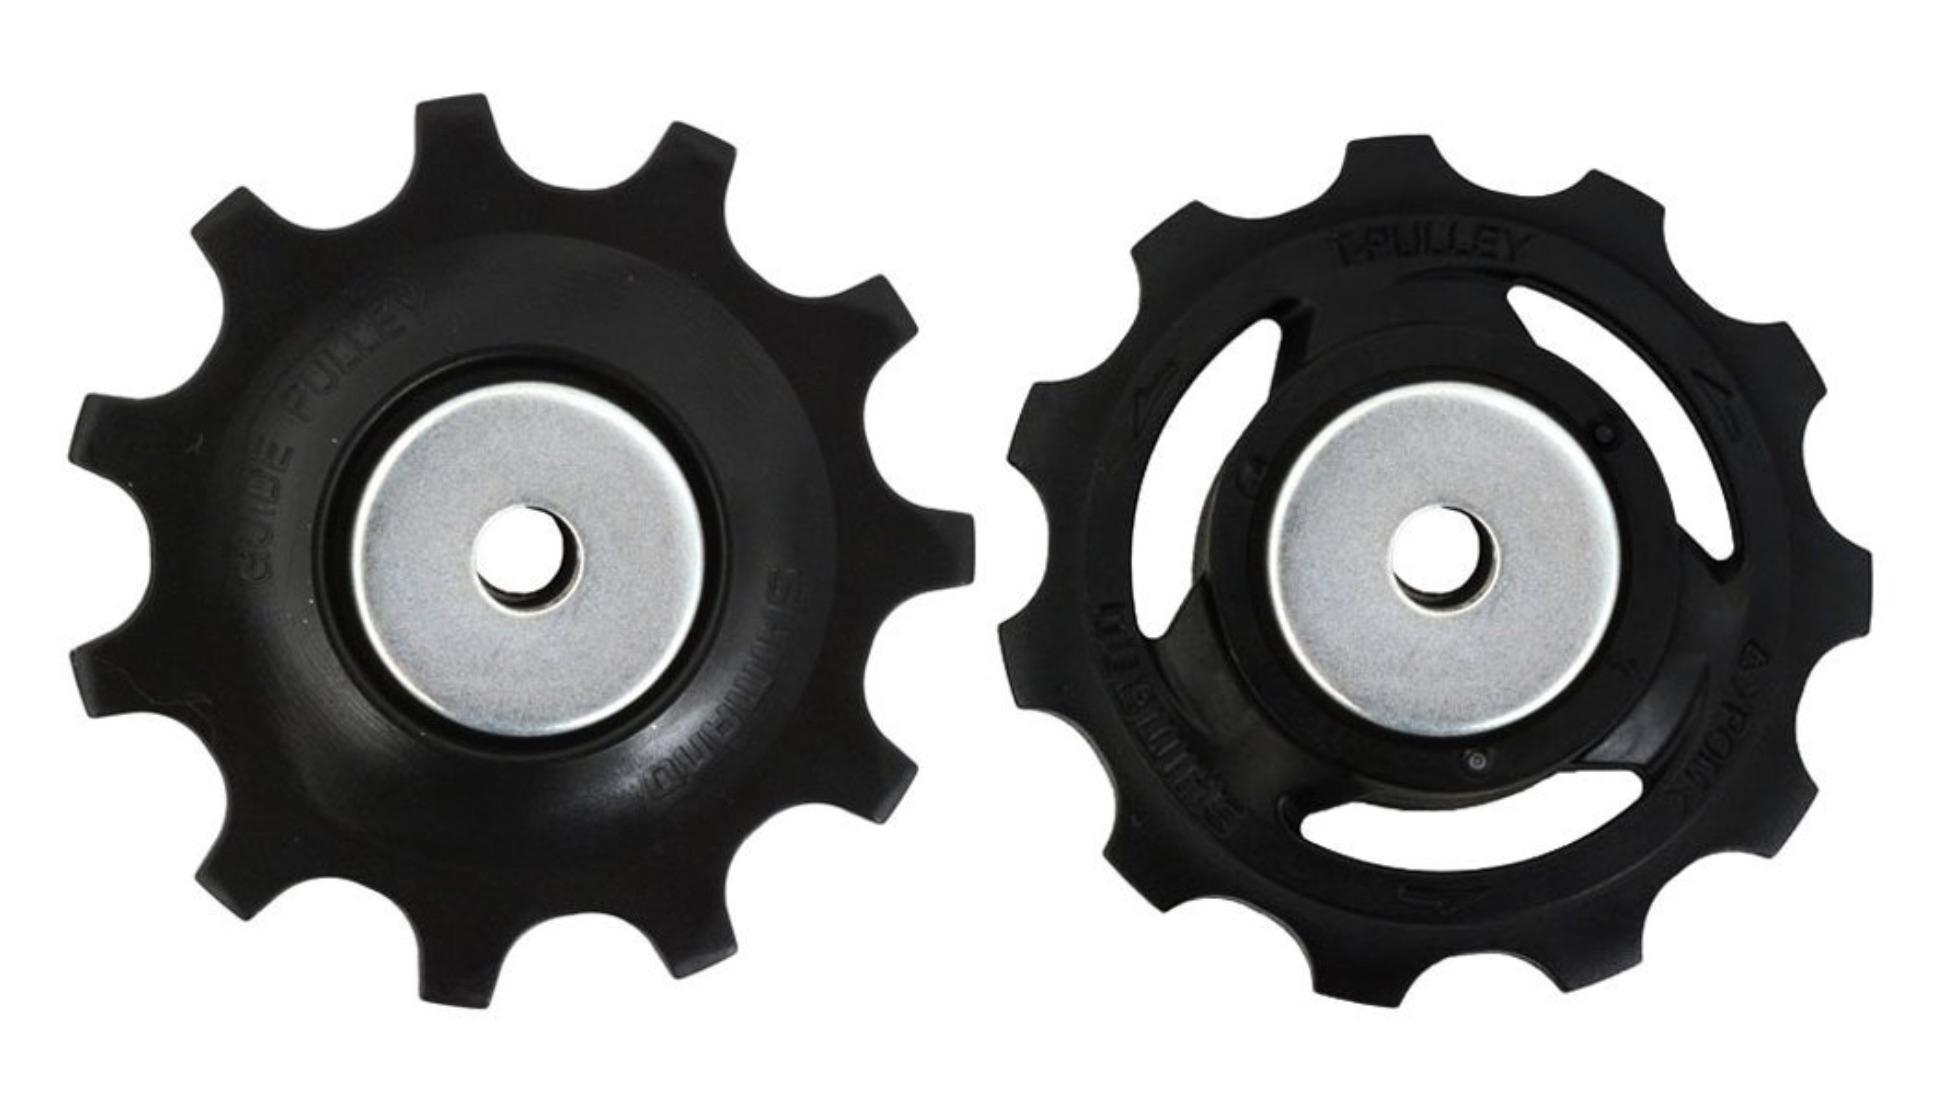 Pulleyhjul Shimano SLX RD-M7100 - 12 speed - Y3F398010 | Pulleyhjul